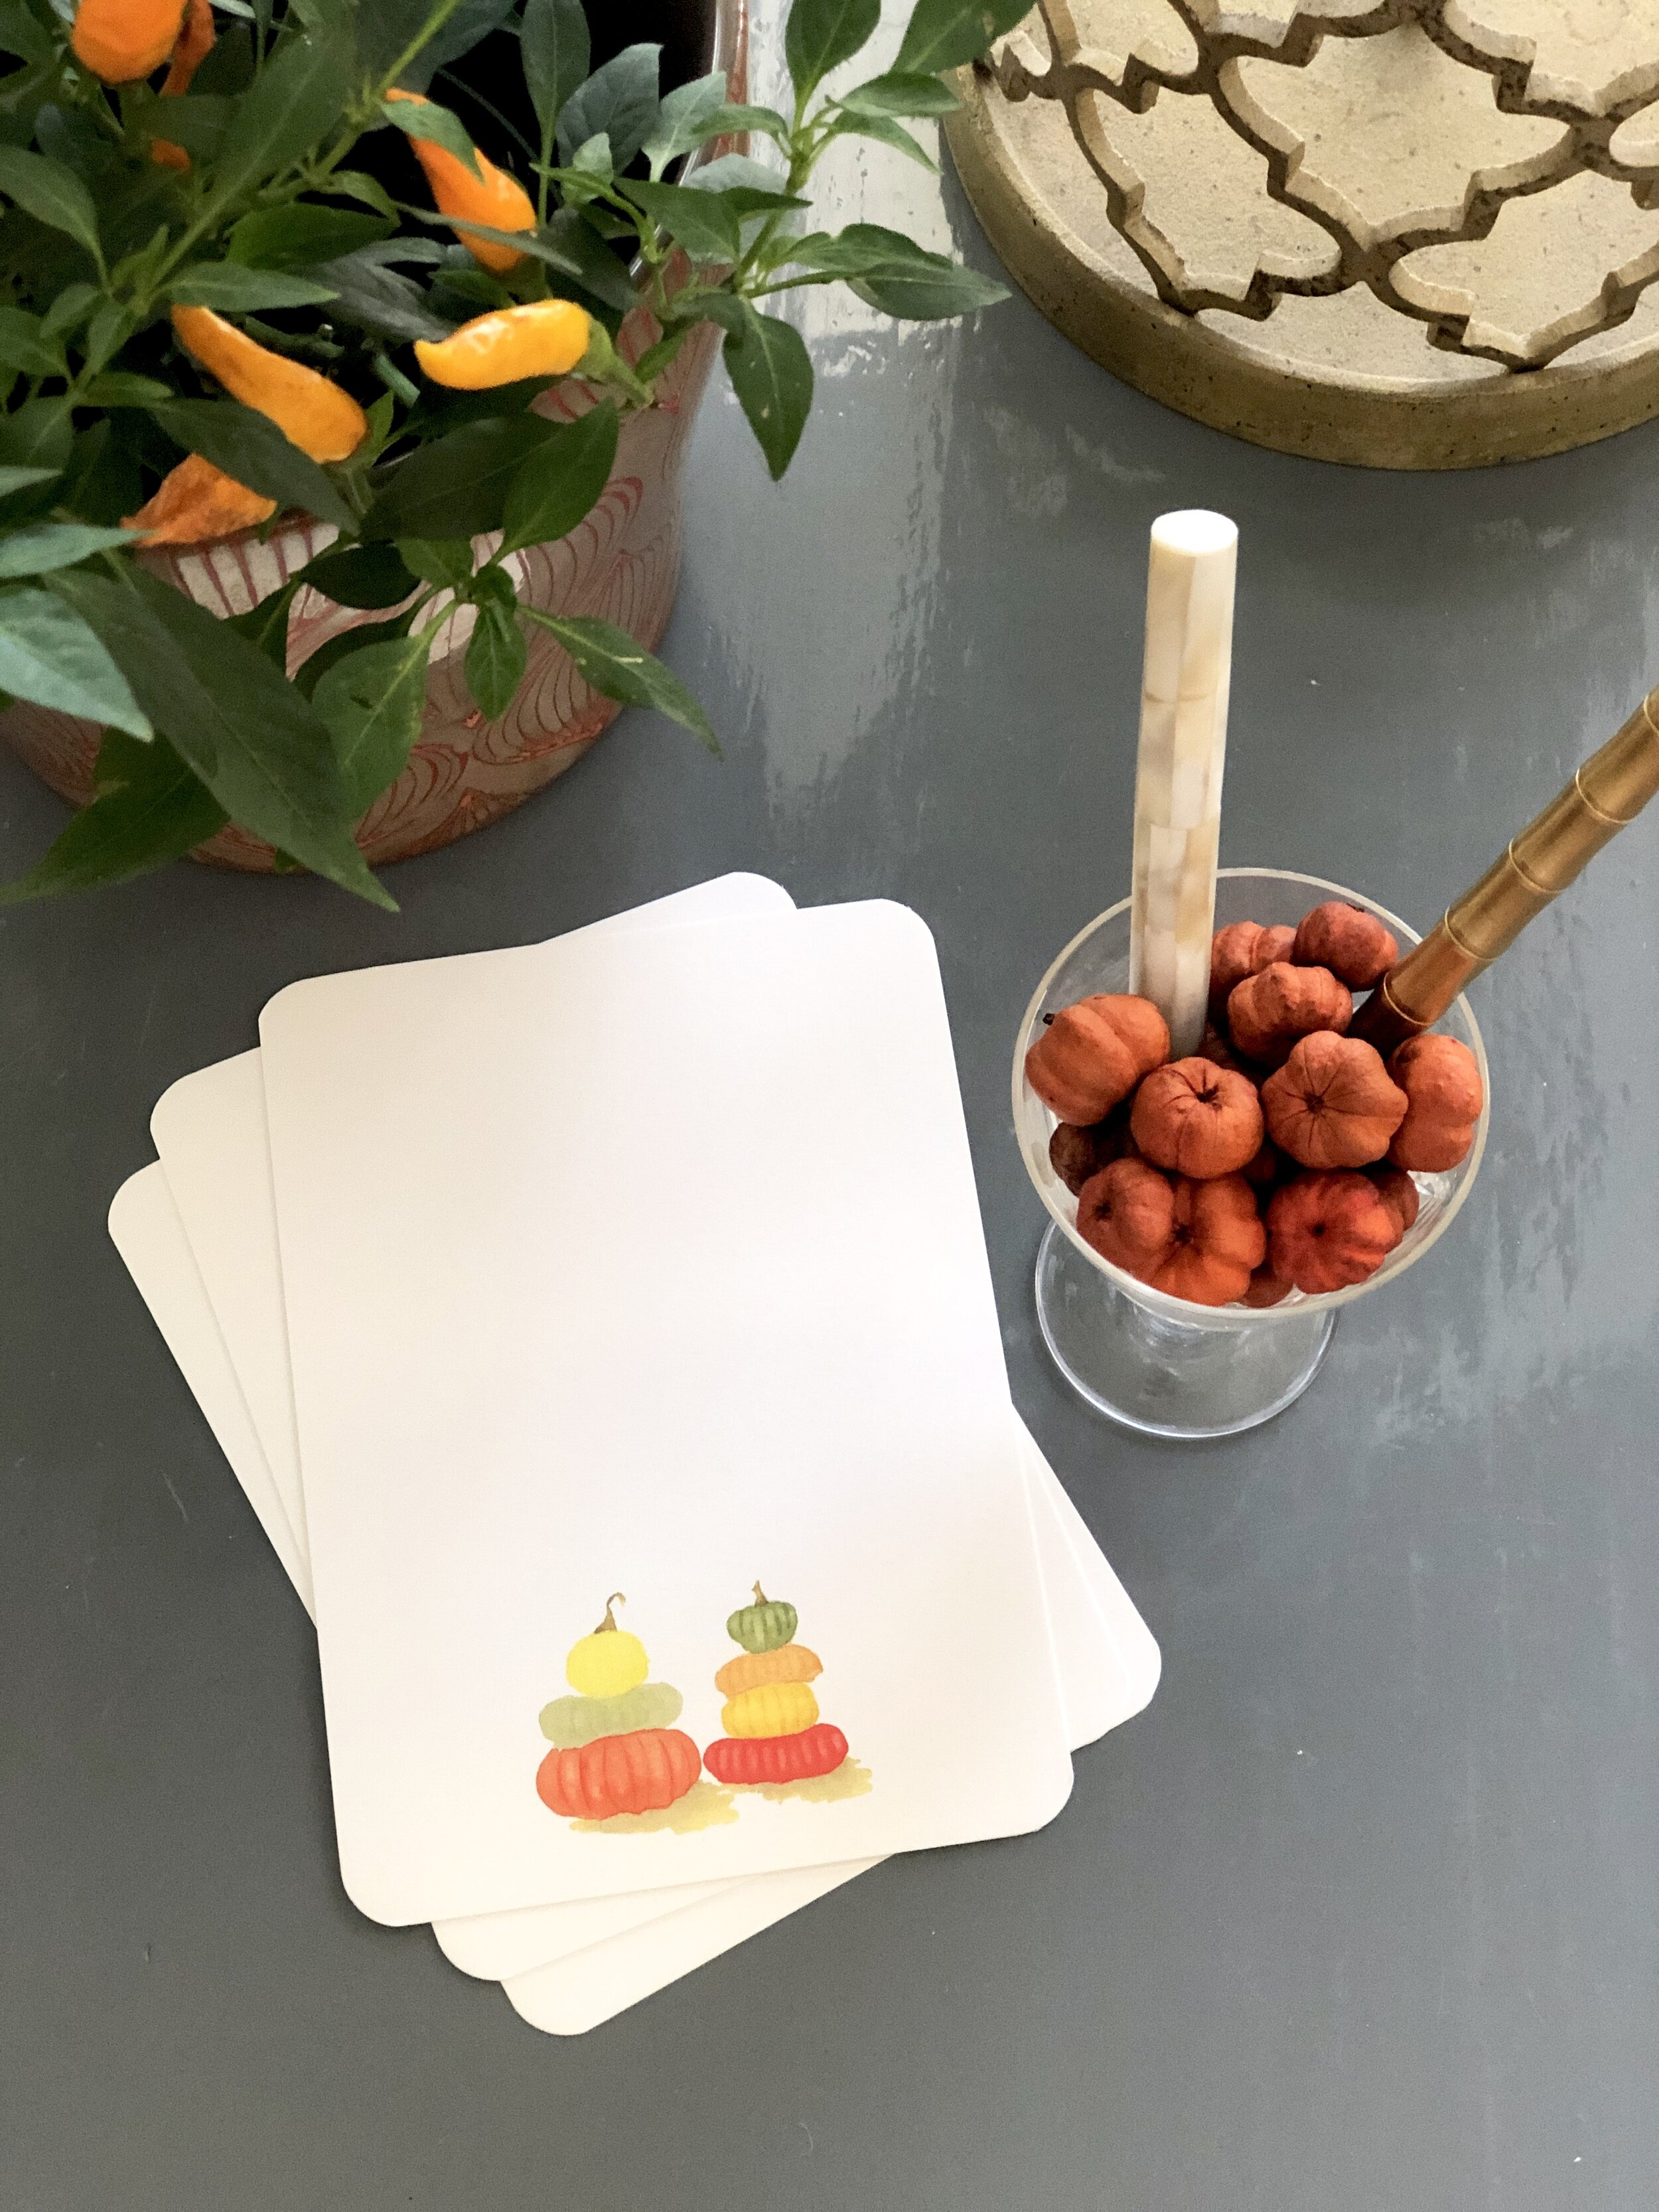 Pumpkin Notecard Set from Calabash Card Co.